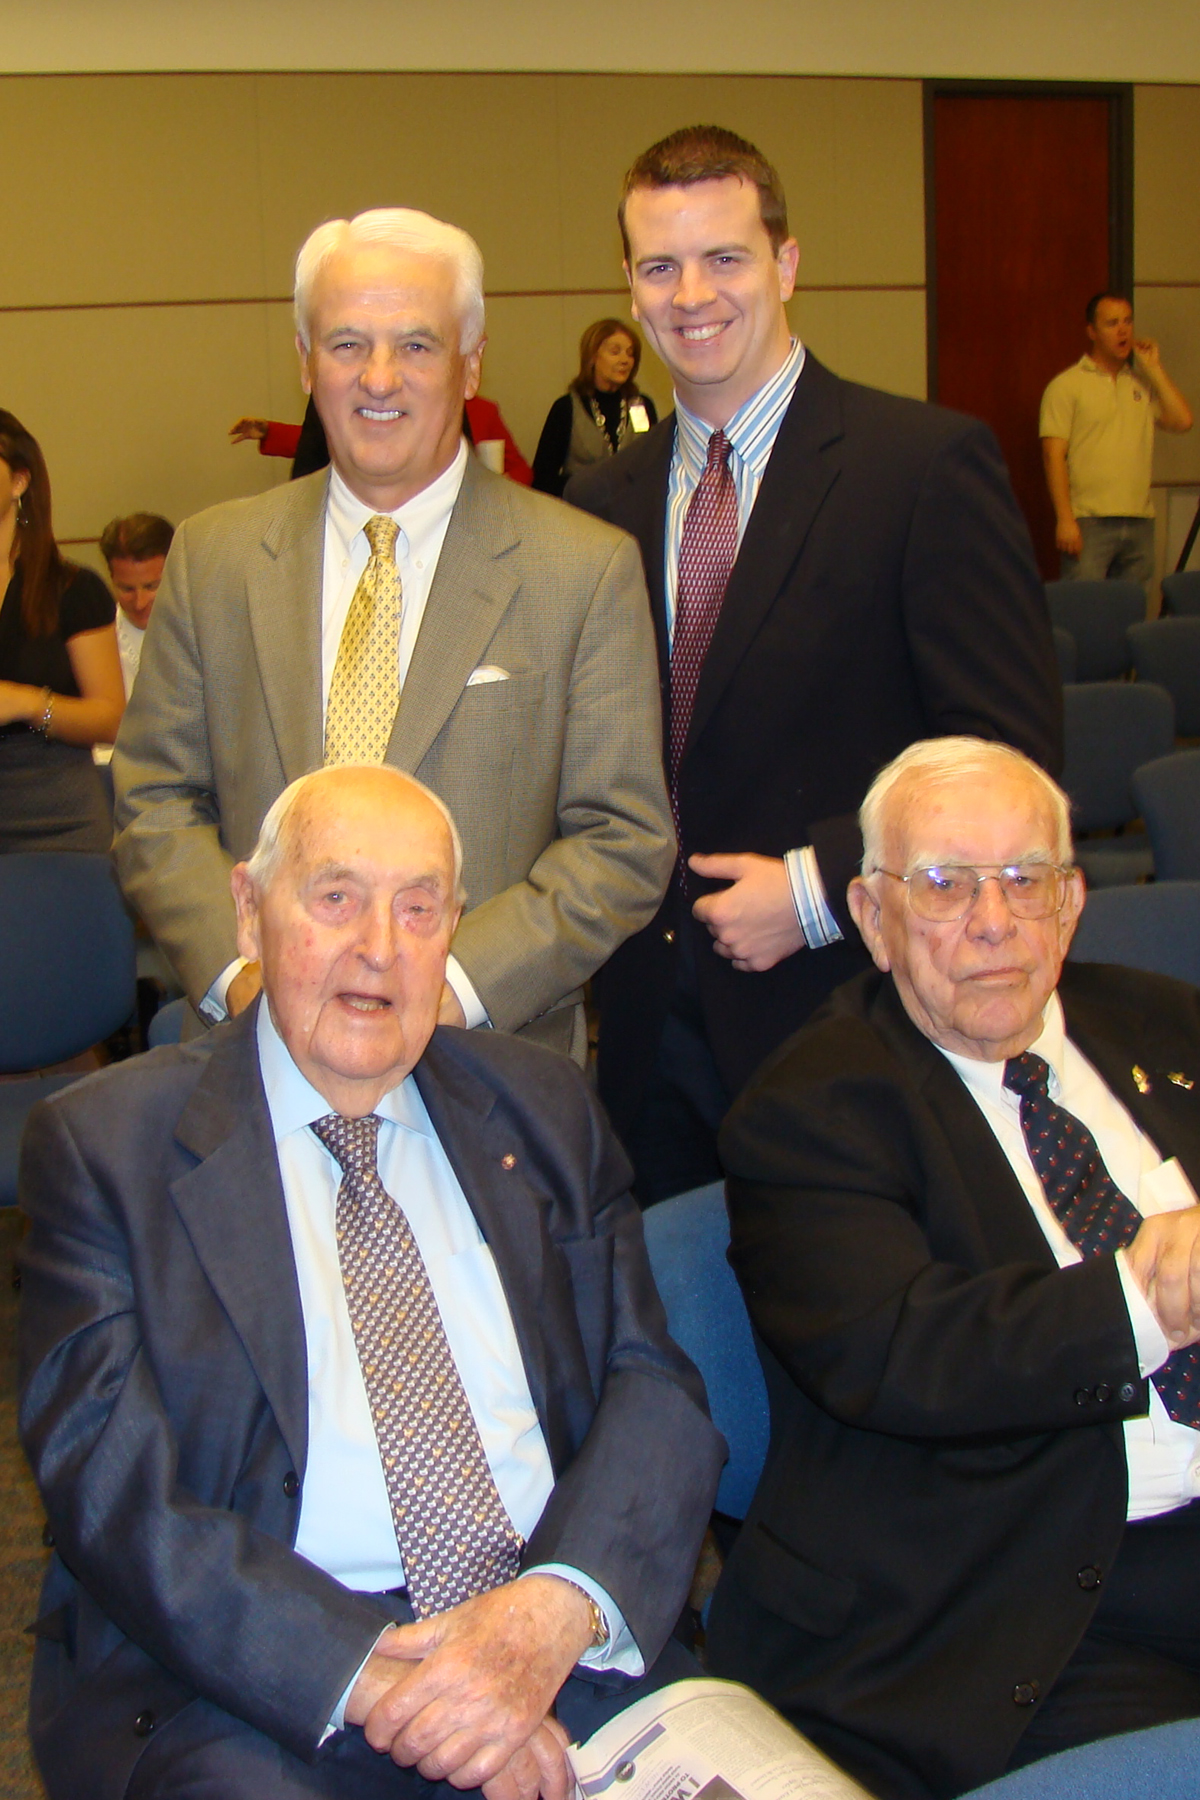 Sir Lennox Hewitt, Bob Cutler; & John & Jack O'Connor, 30 Oct '08.jpg